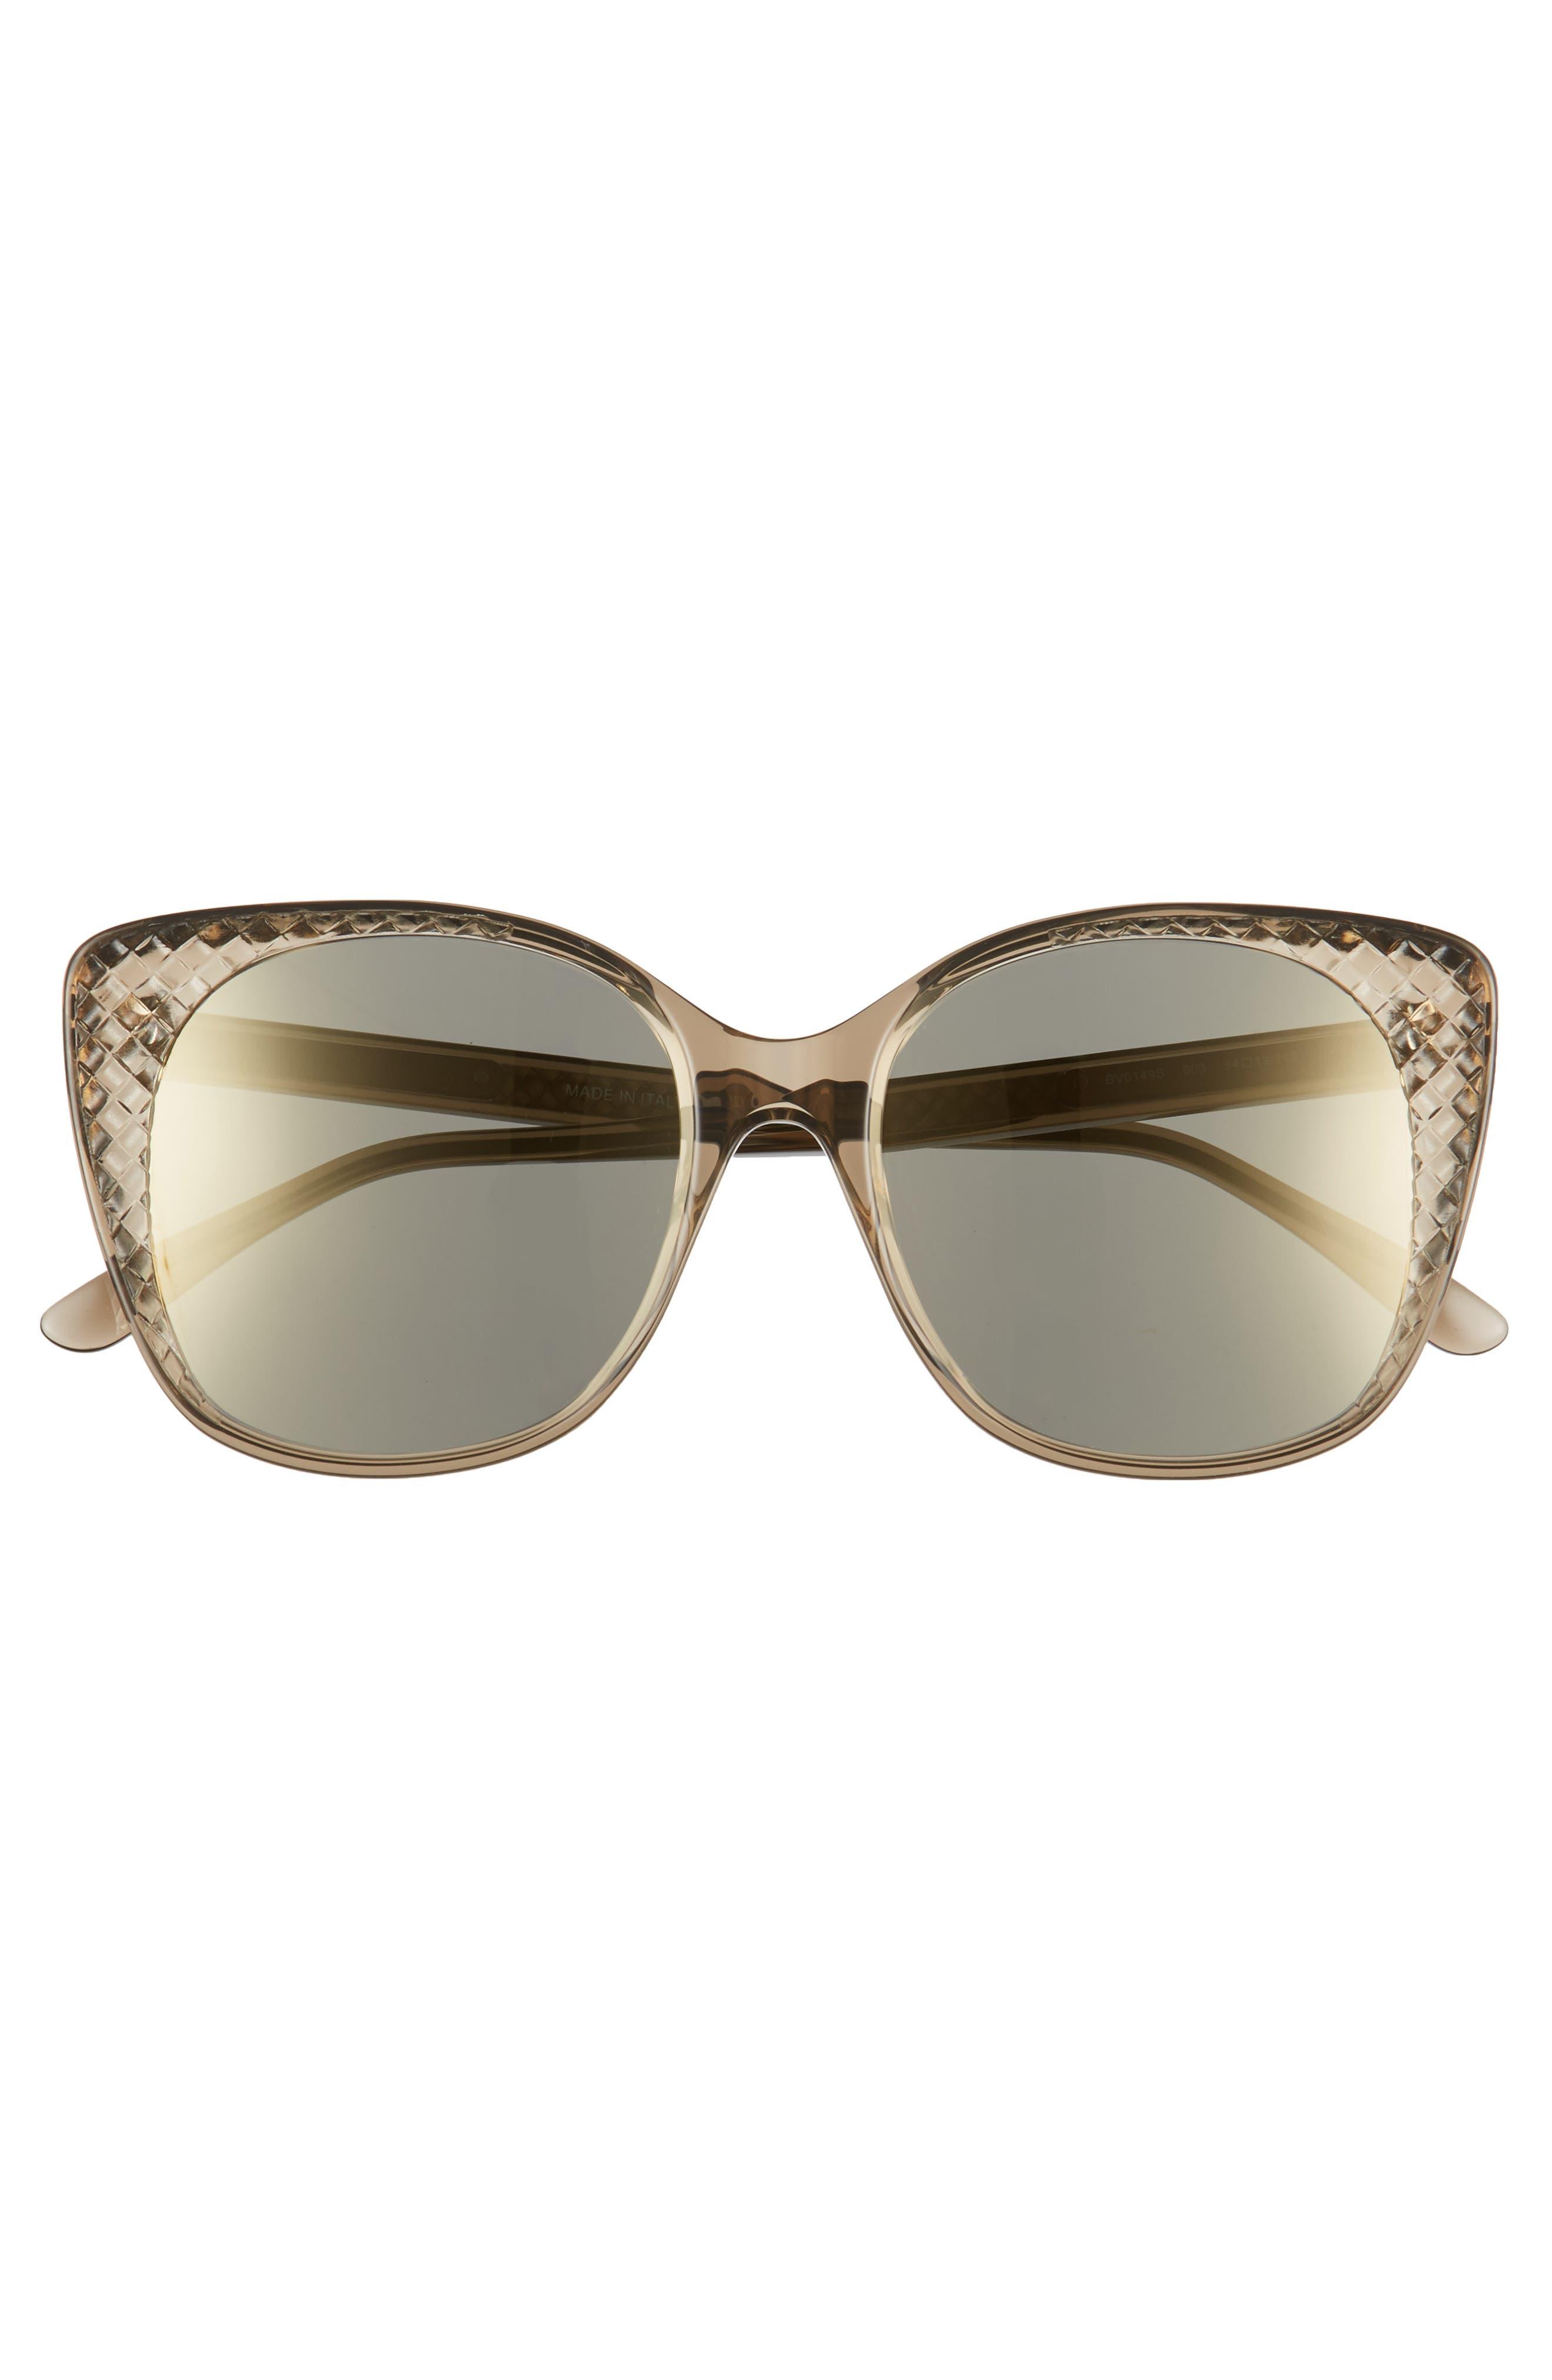 54mm Sunglasses,                             Alternate thumbnail 3, color,                             BROWN